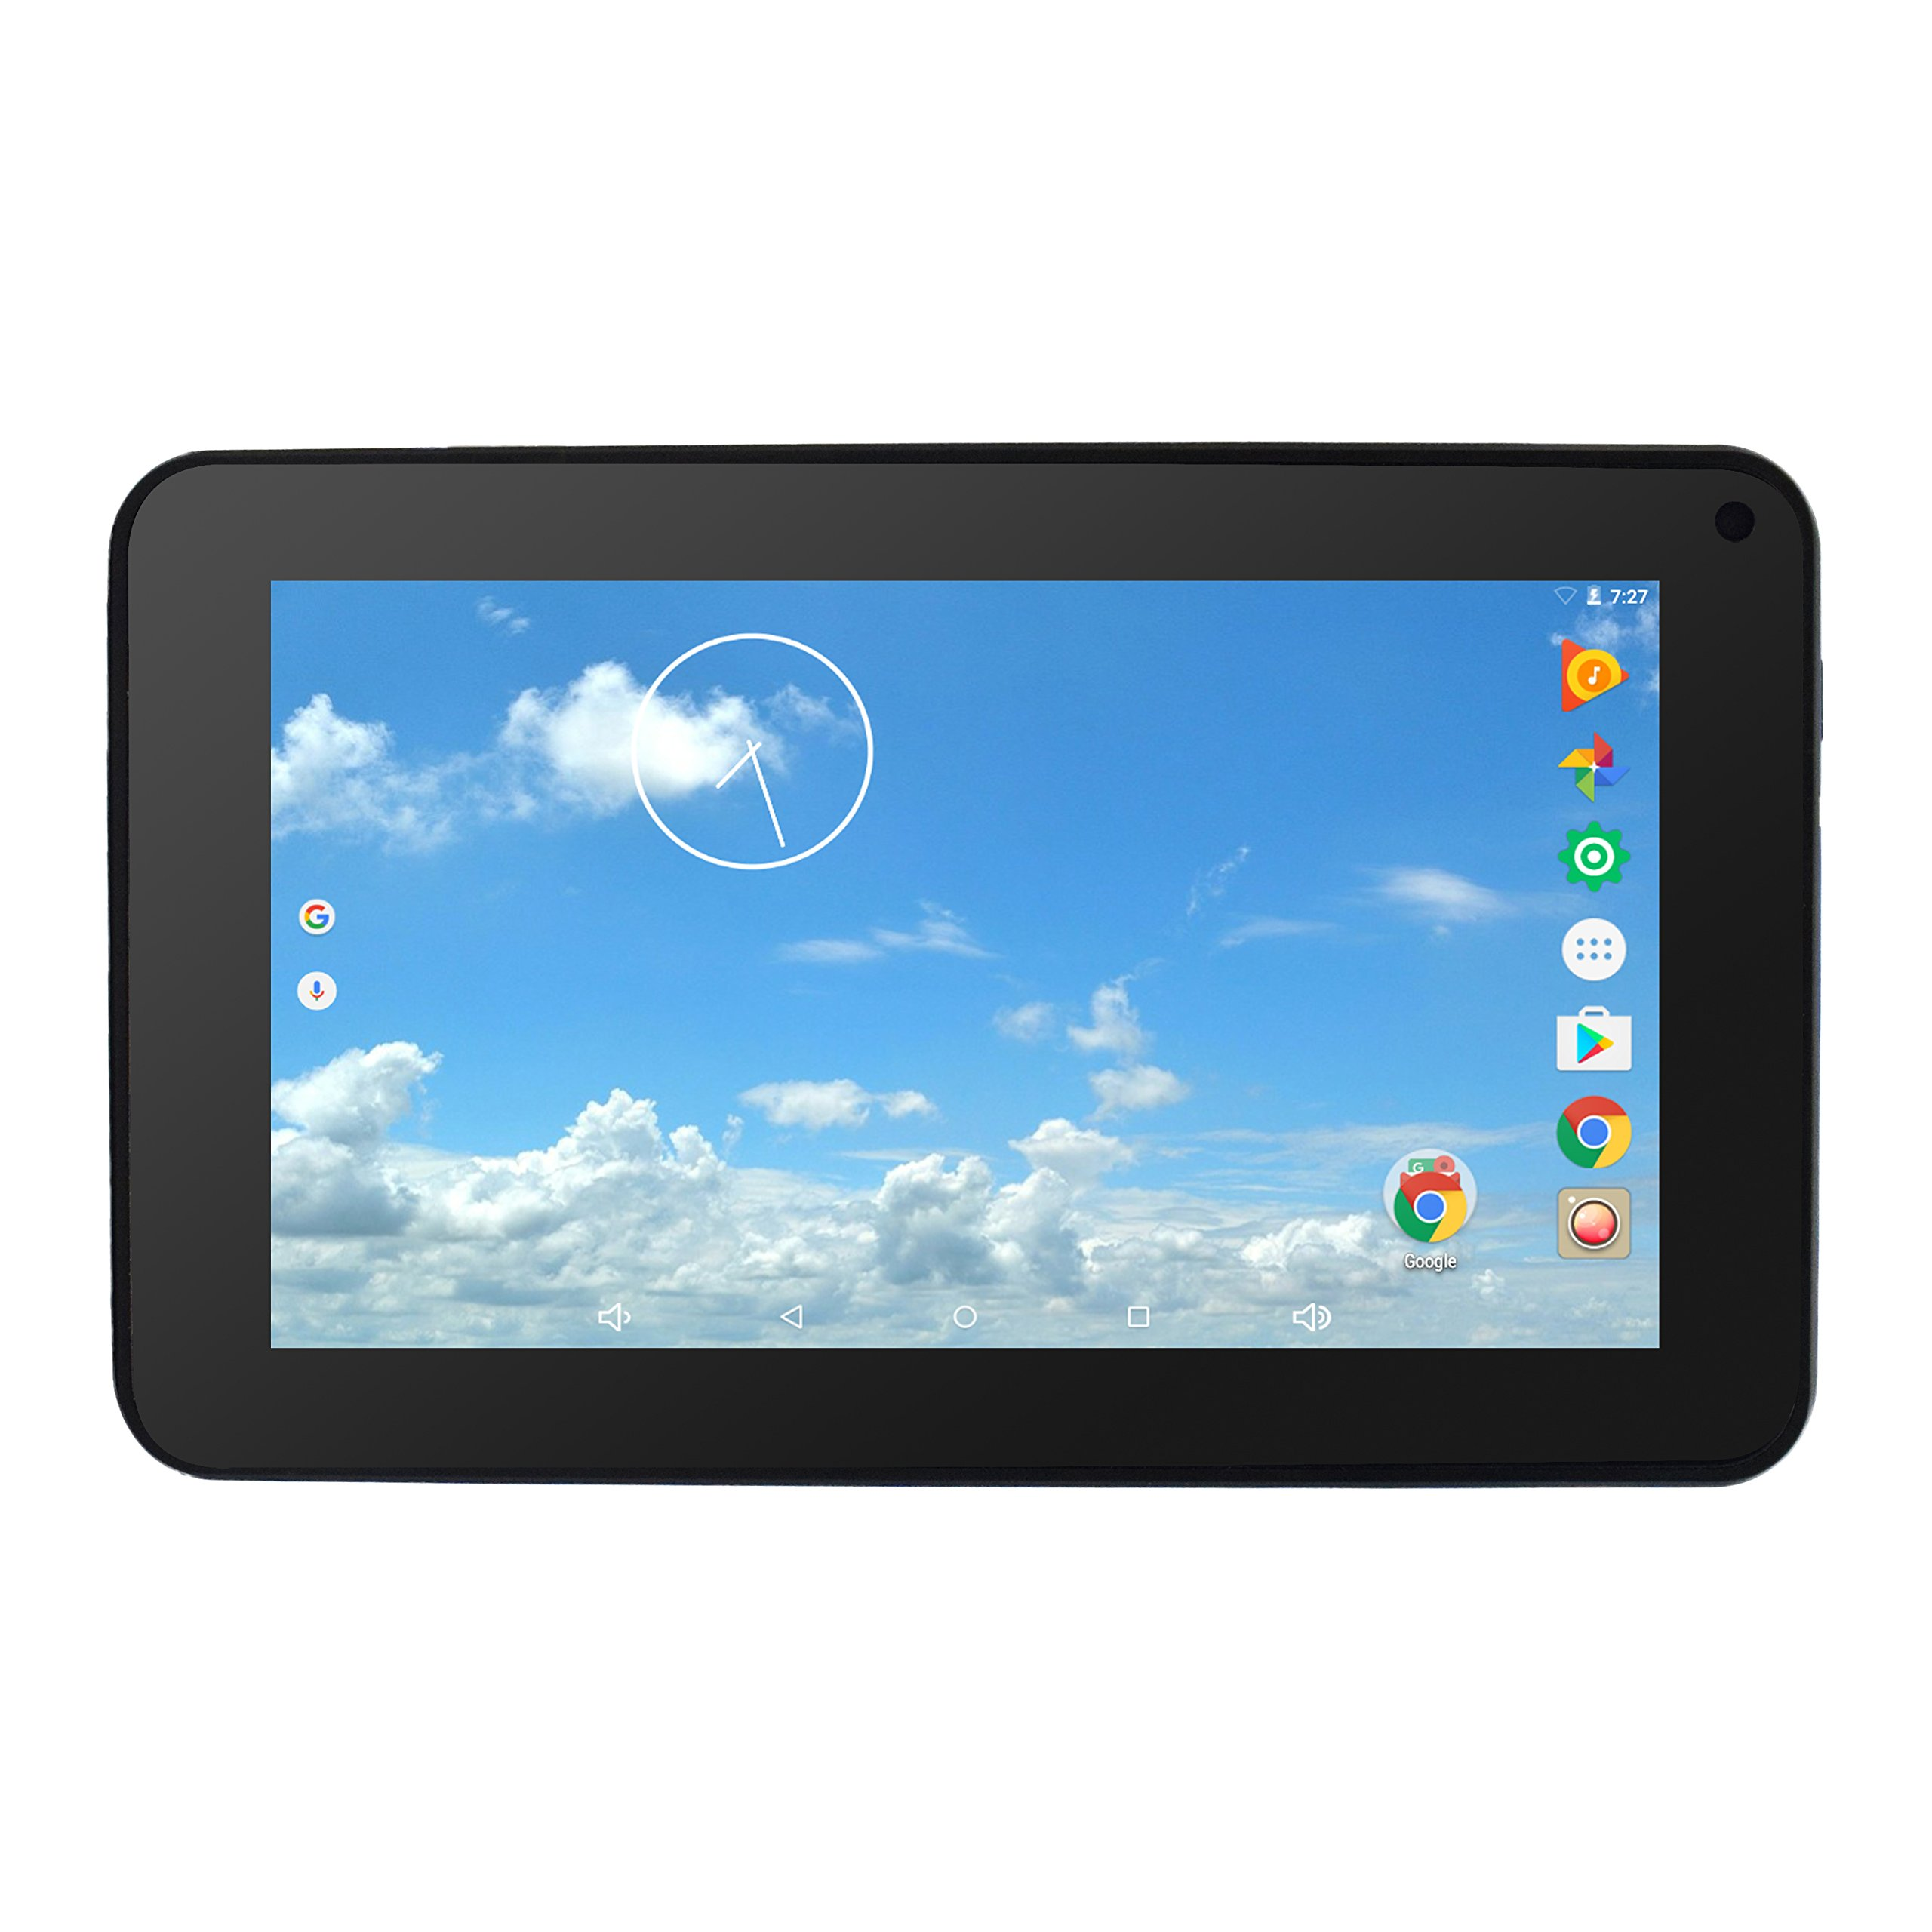 iVIEW-769TPCII 7'' Android Tablet, 1024 X 600 IPS Display, Cortex A53 Quod Core CPU 1.2GHz, 1GB/16GB, Dual Camera, WiFi 802.11 b/g/n, Bluetooth 4.0